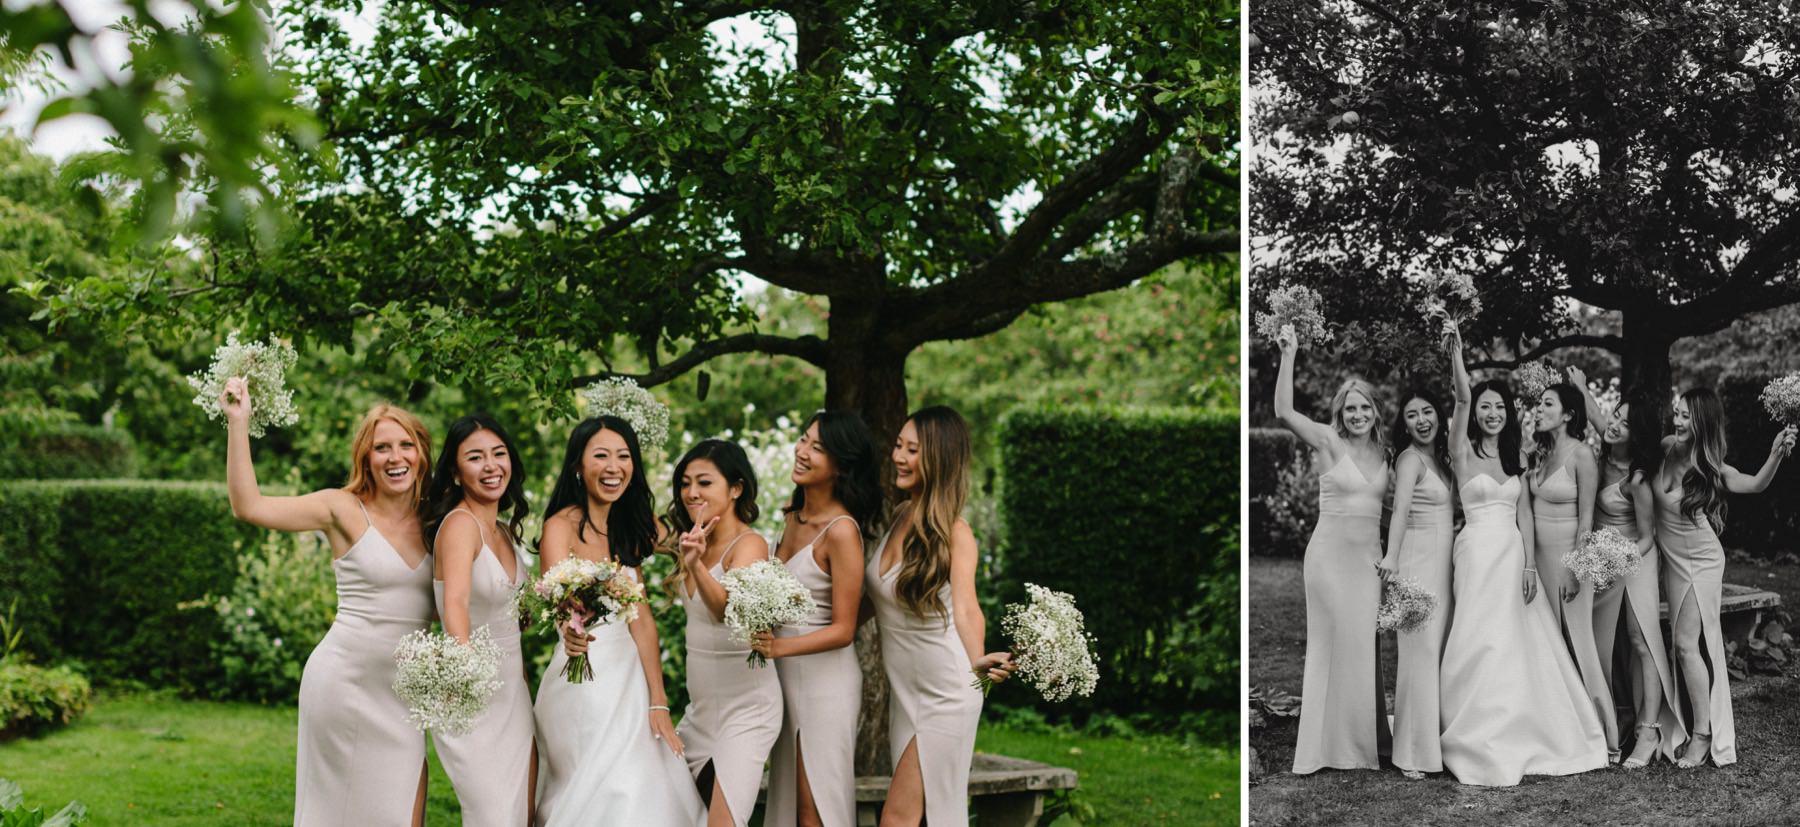 bridesmaids Rosendals Trädgård